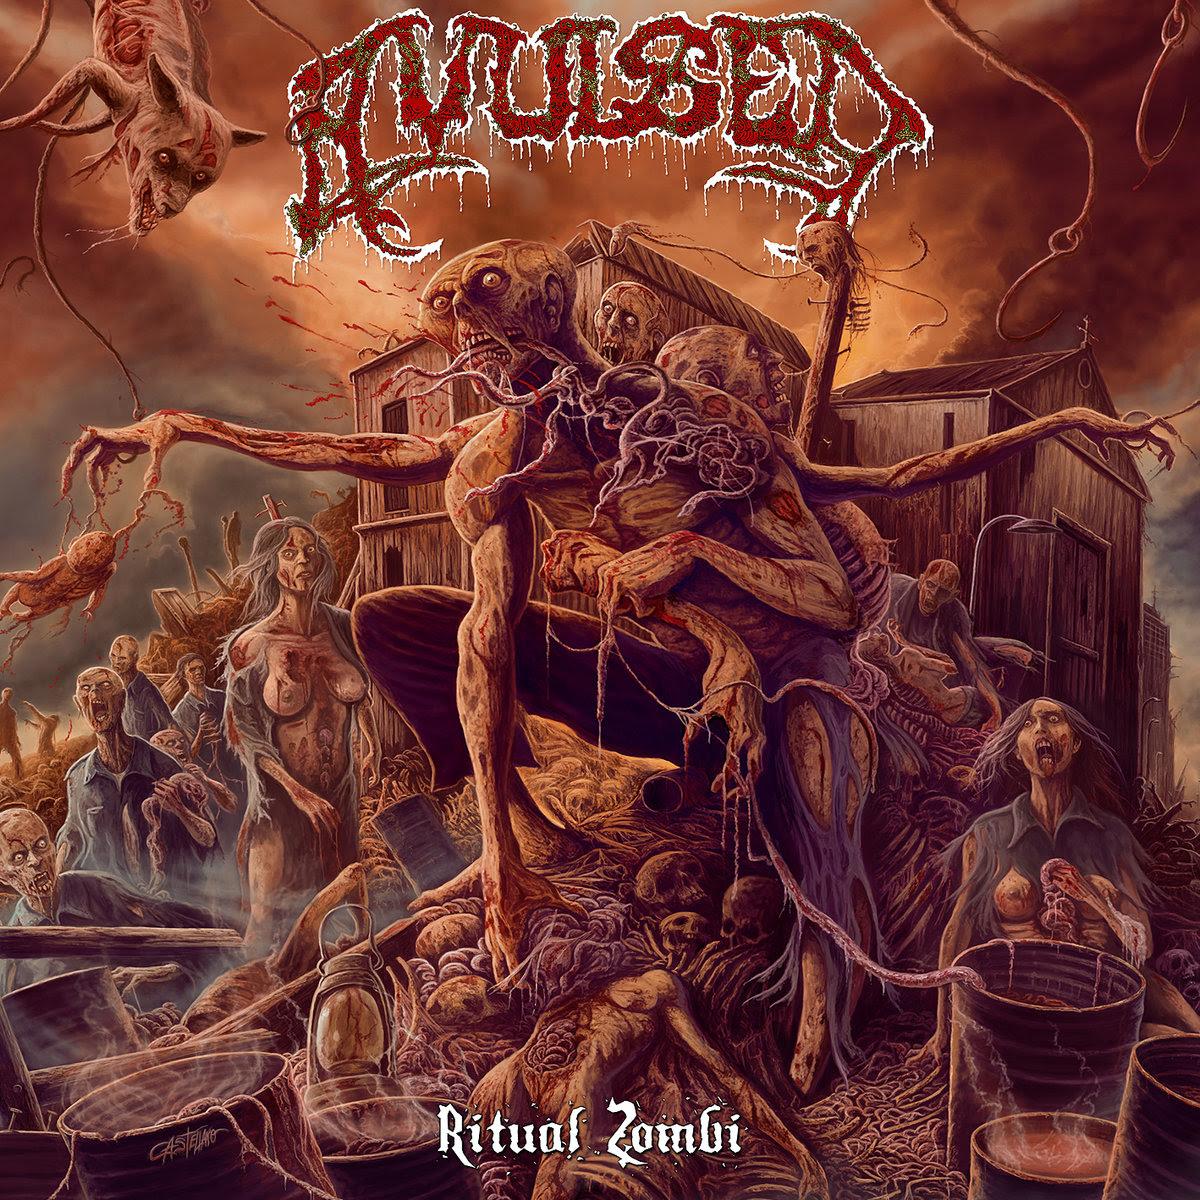 Avulsed - Ritual Zombi (2013)